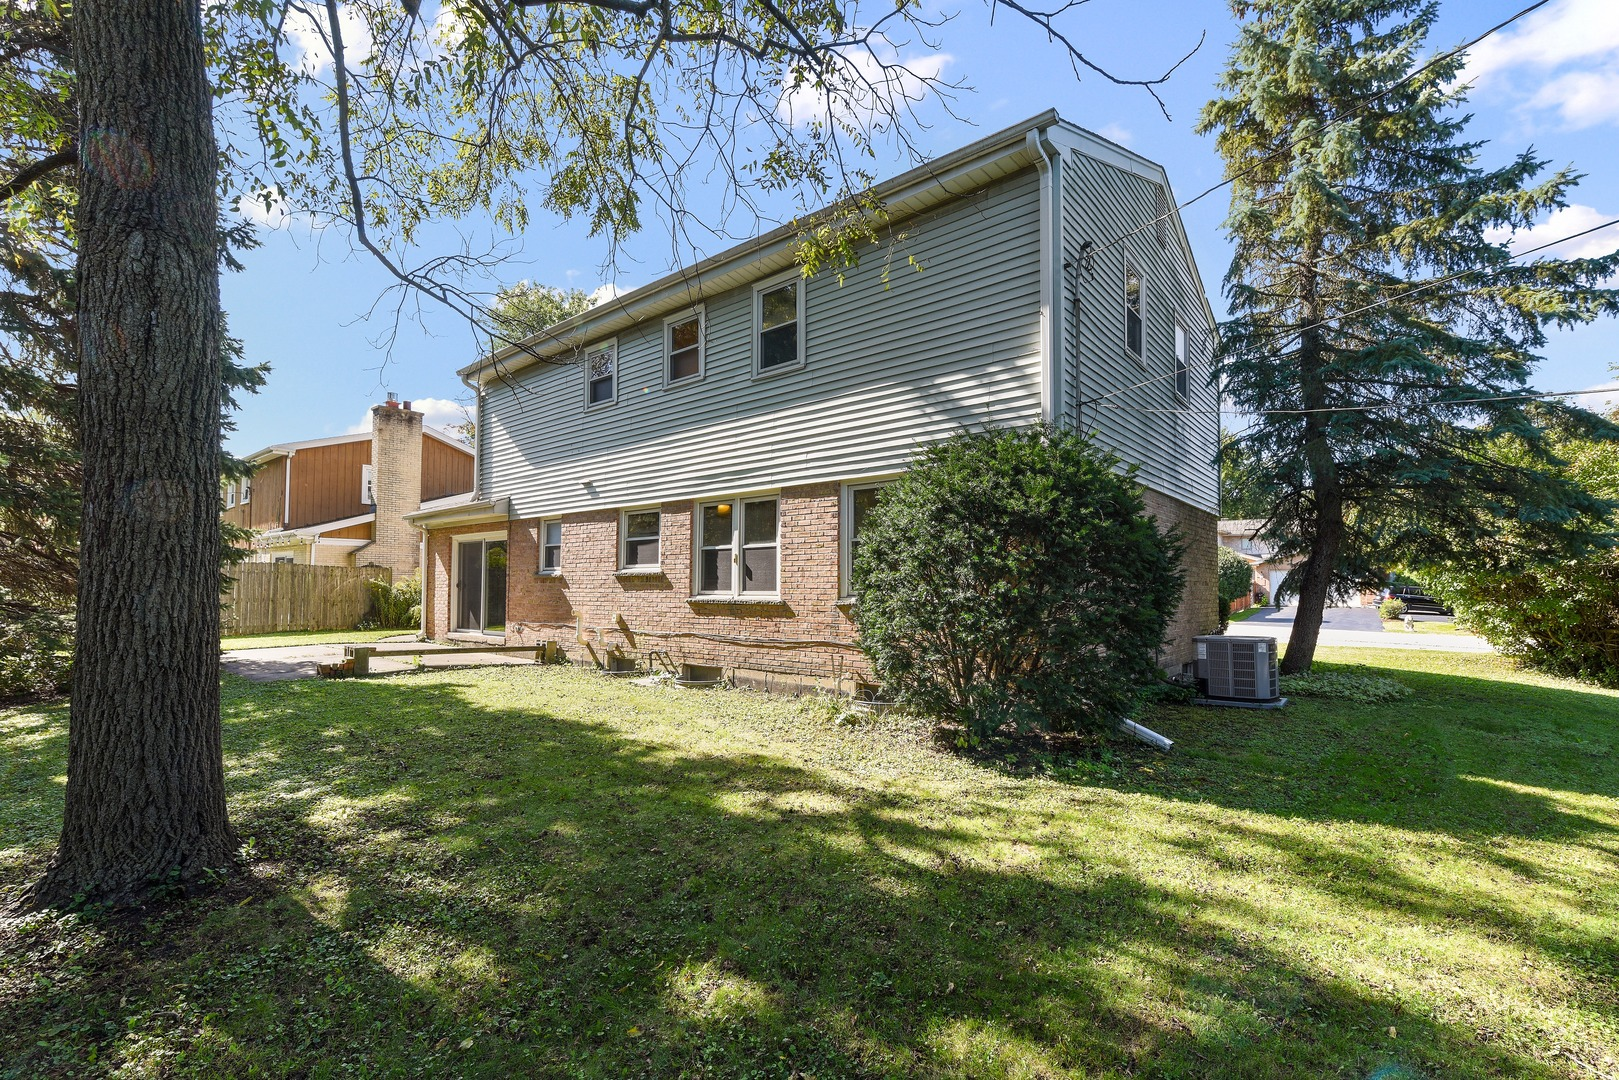 945 Huber, Glenview, Illinois, 60025